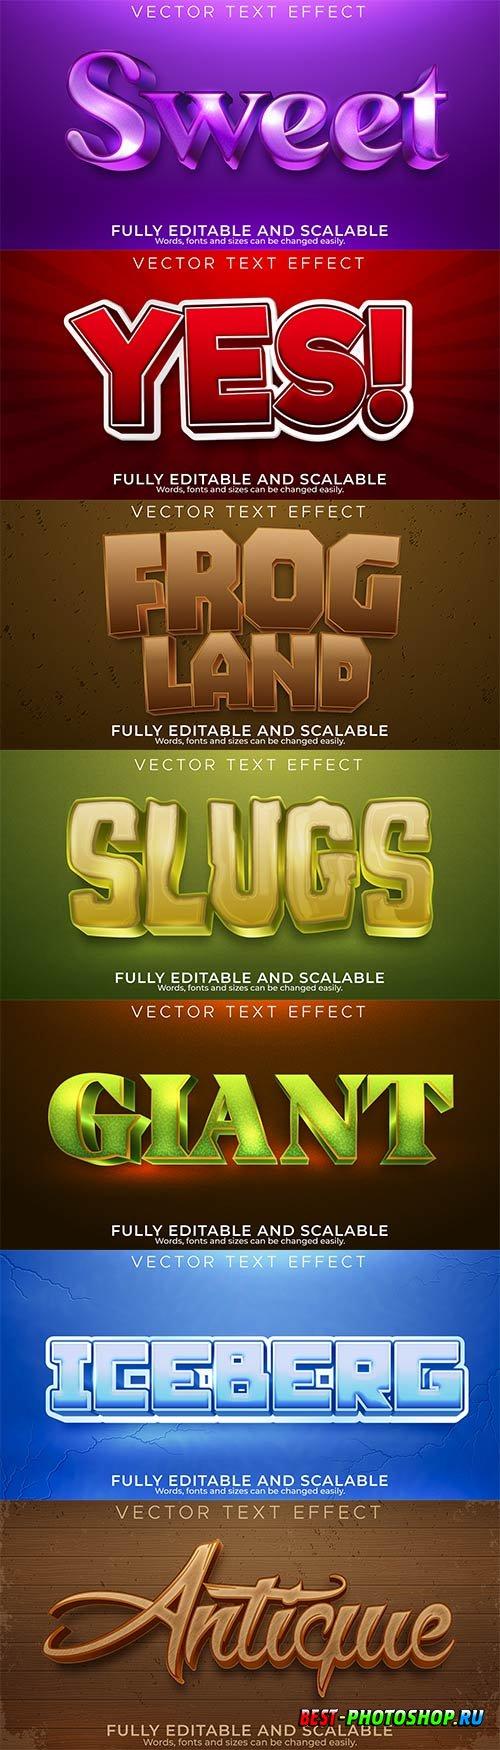 3d editable text style effect vector vol 863